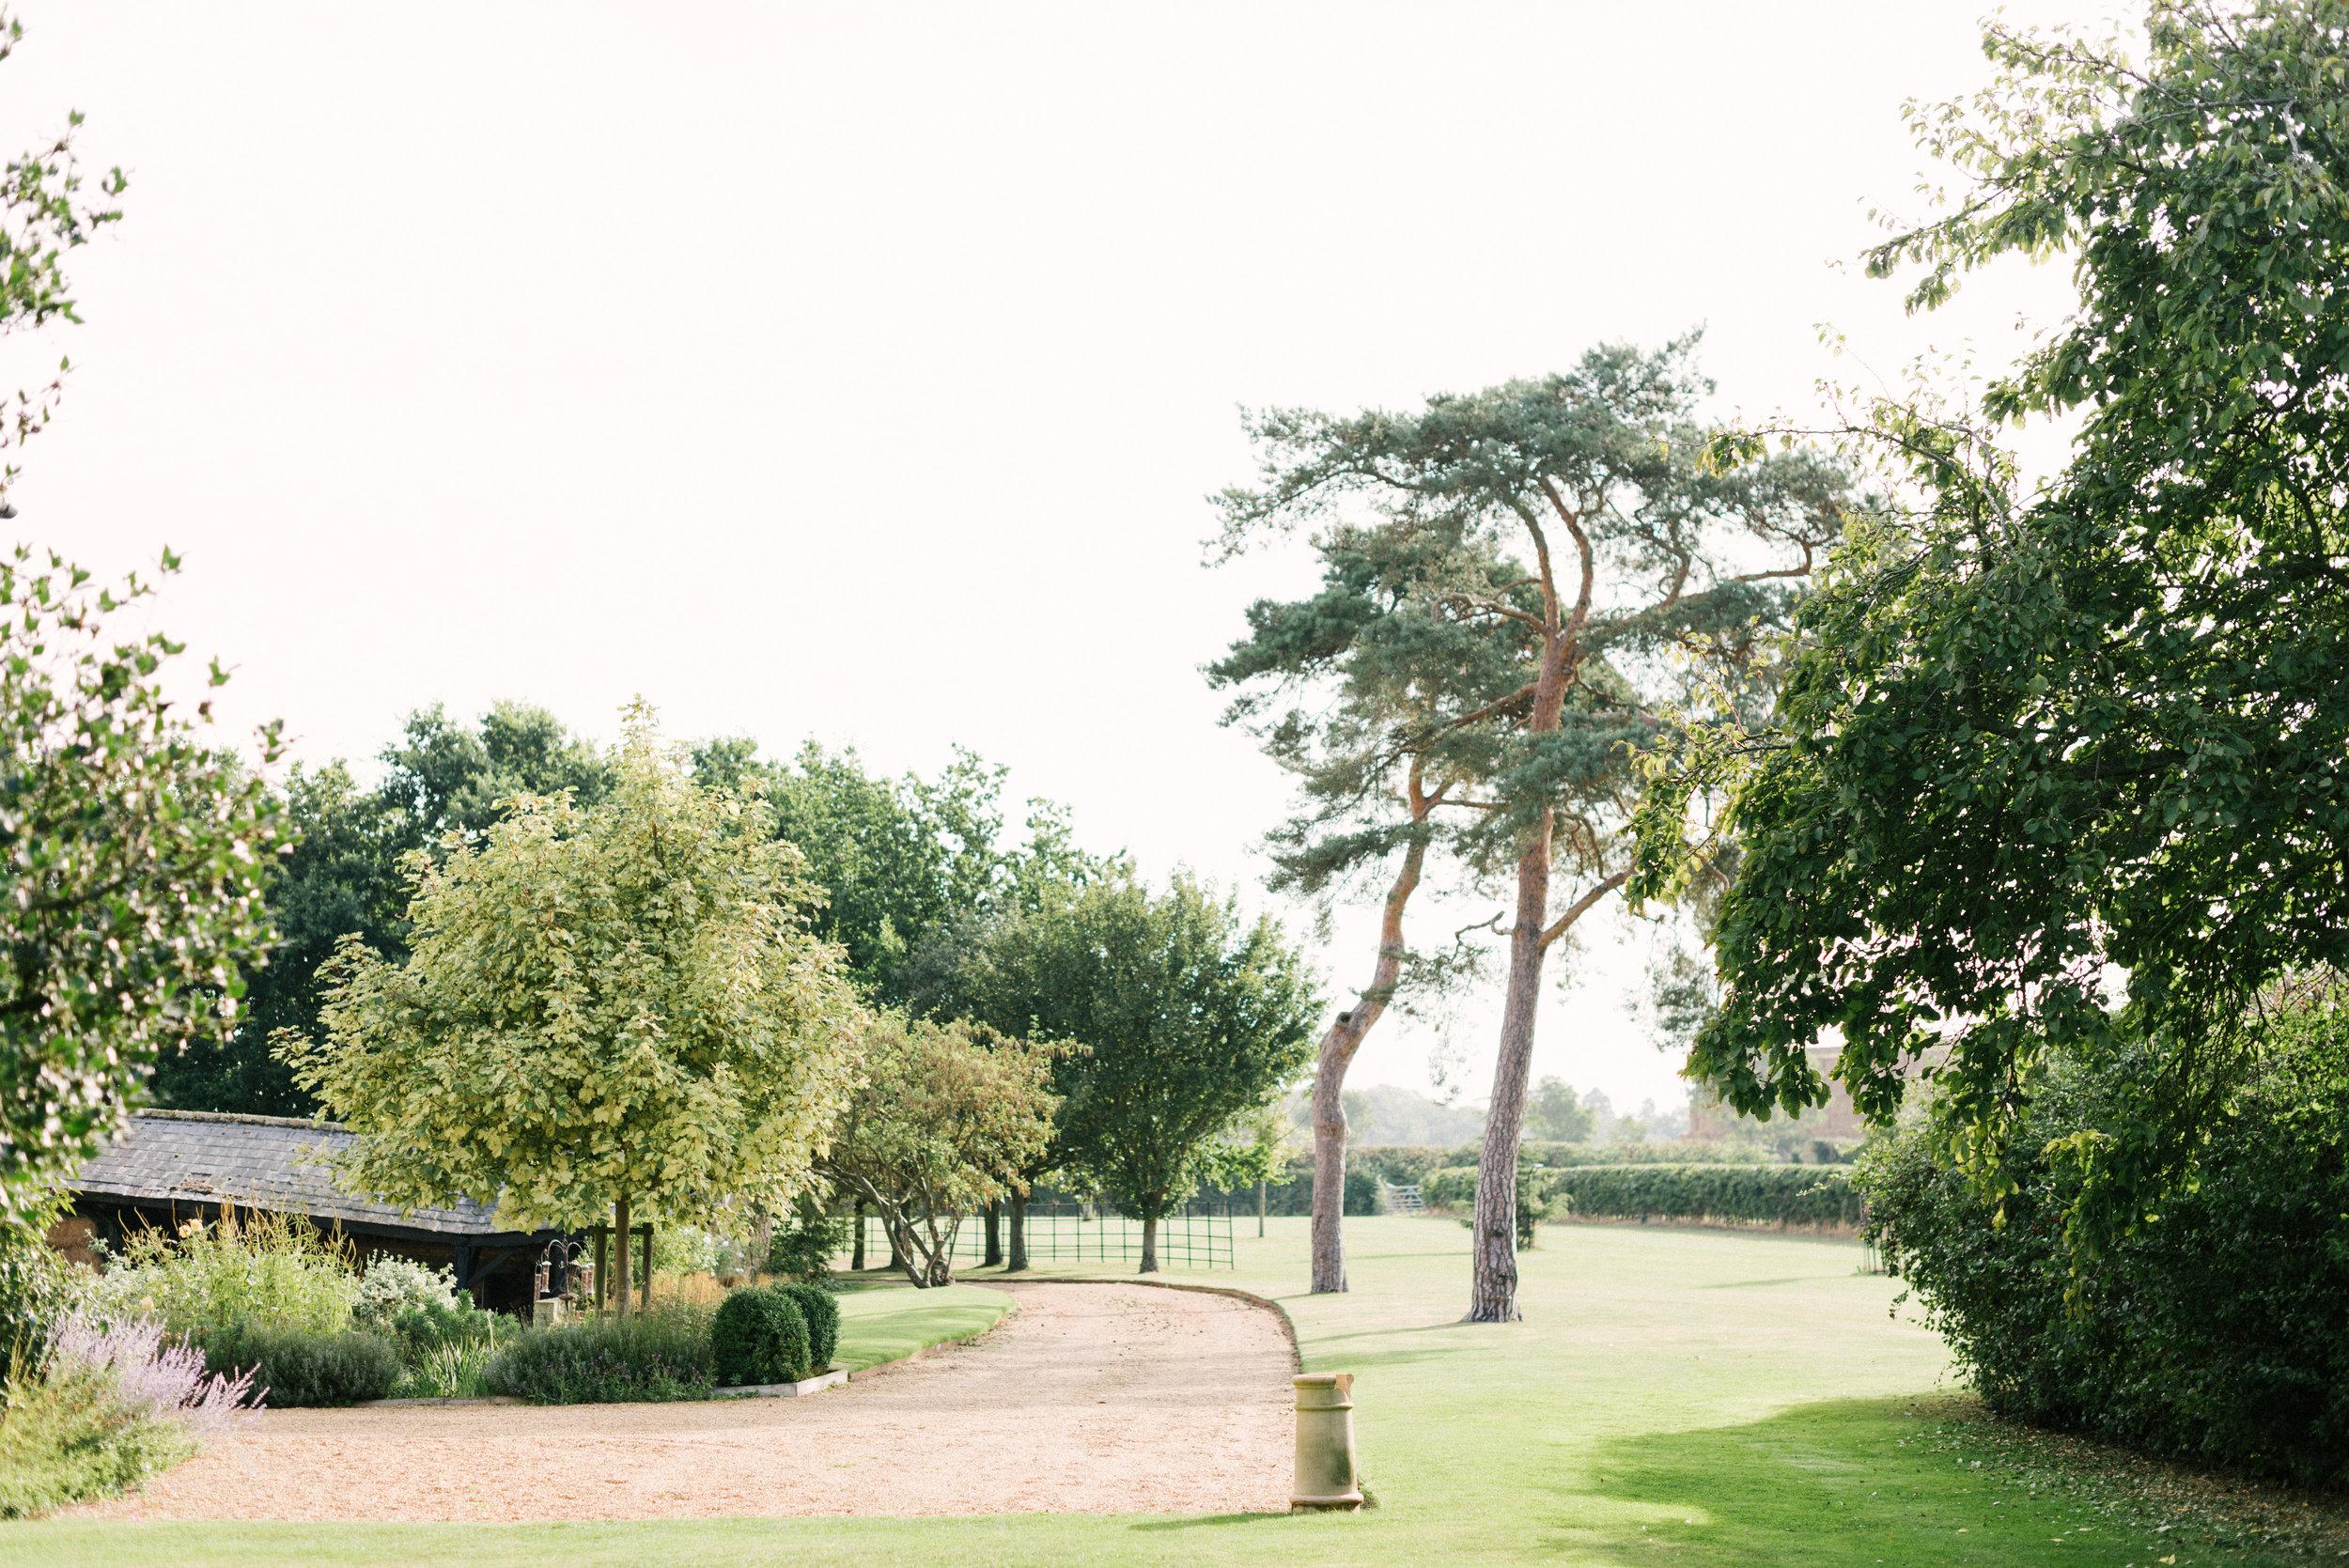 lattenbury_farm_hannah_duffy-107.jpg